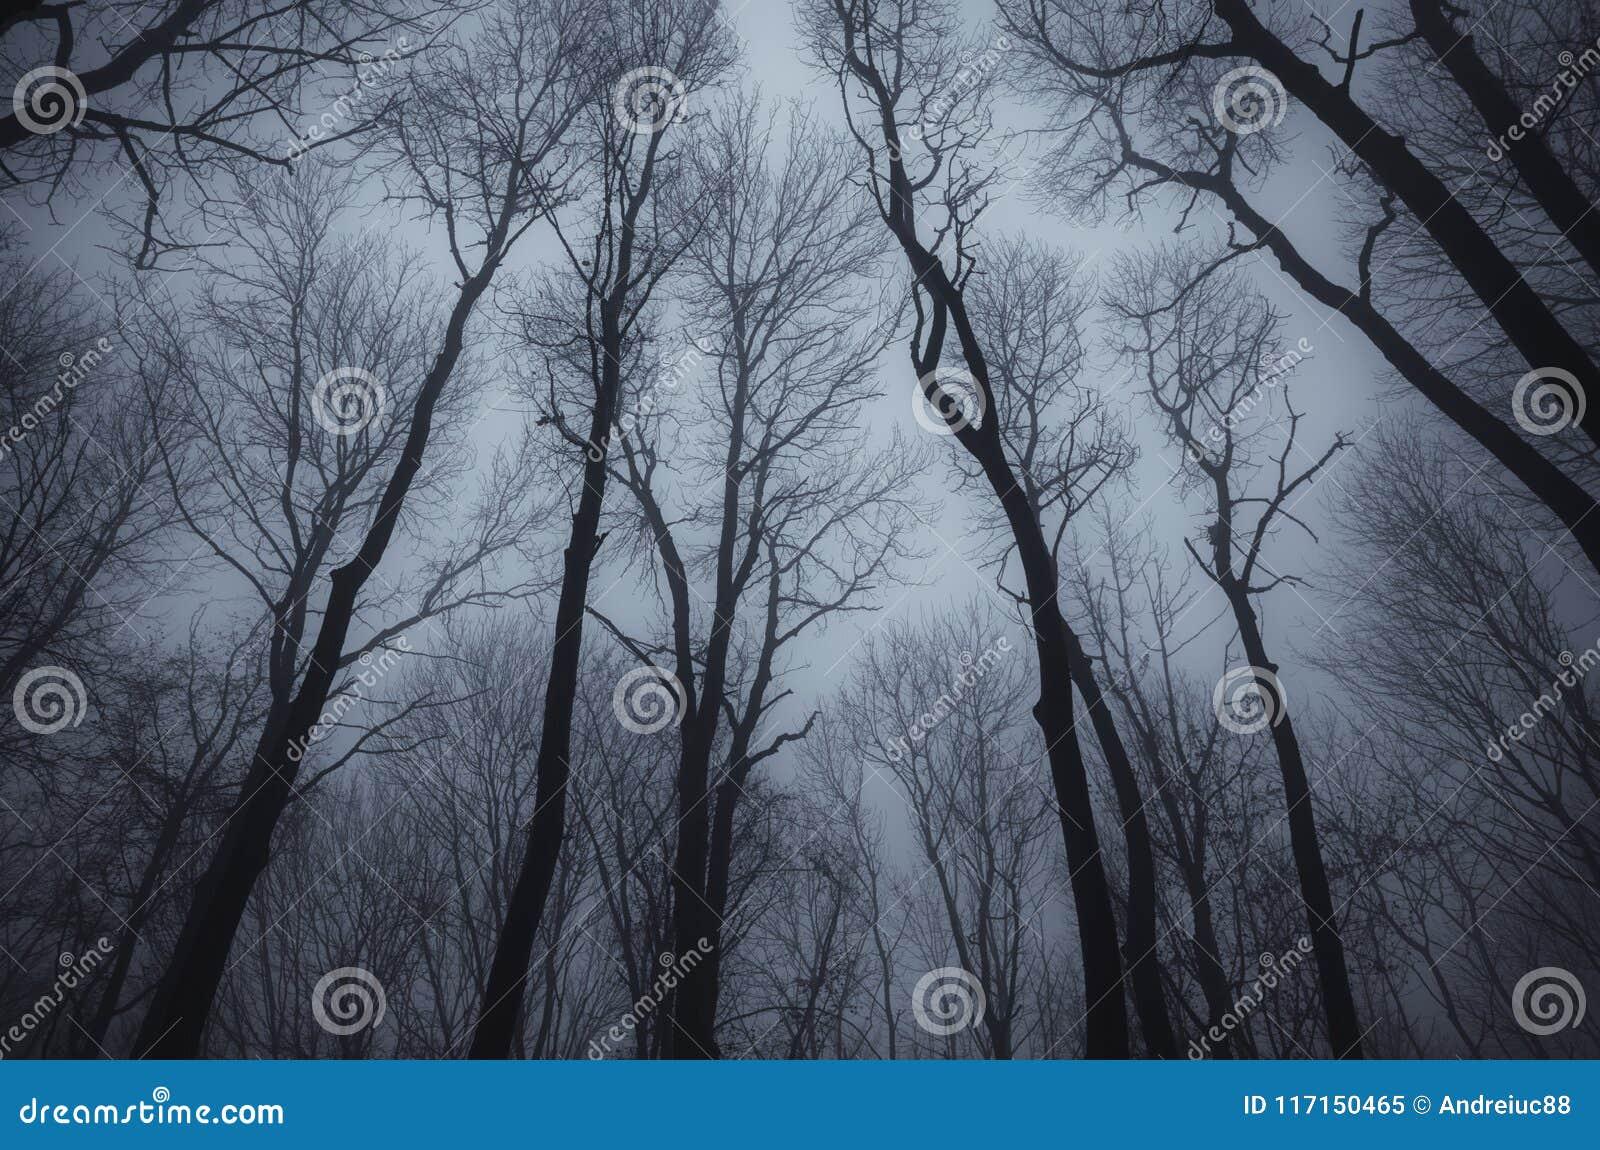 Leafless trees in dark haunted woods